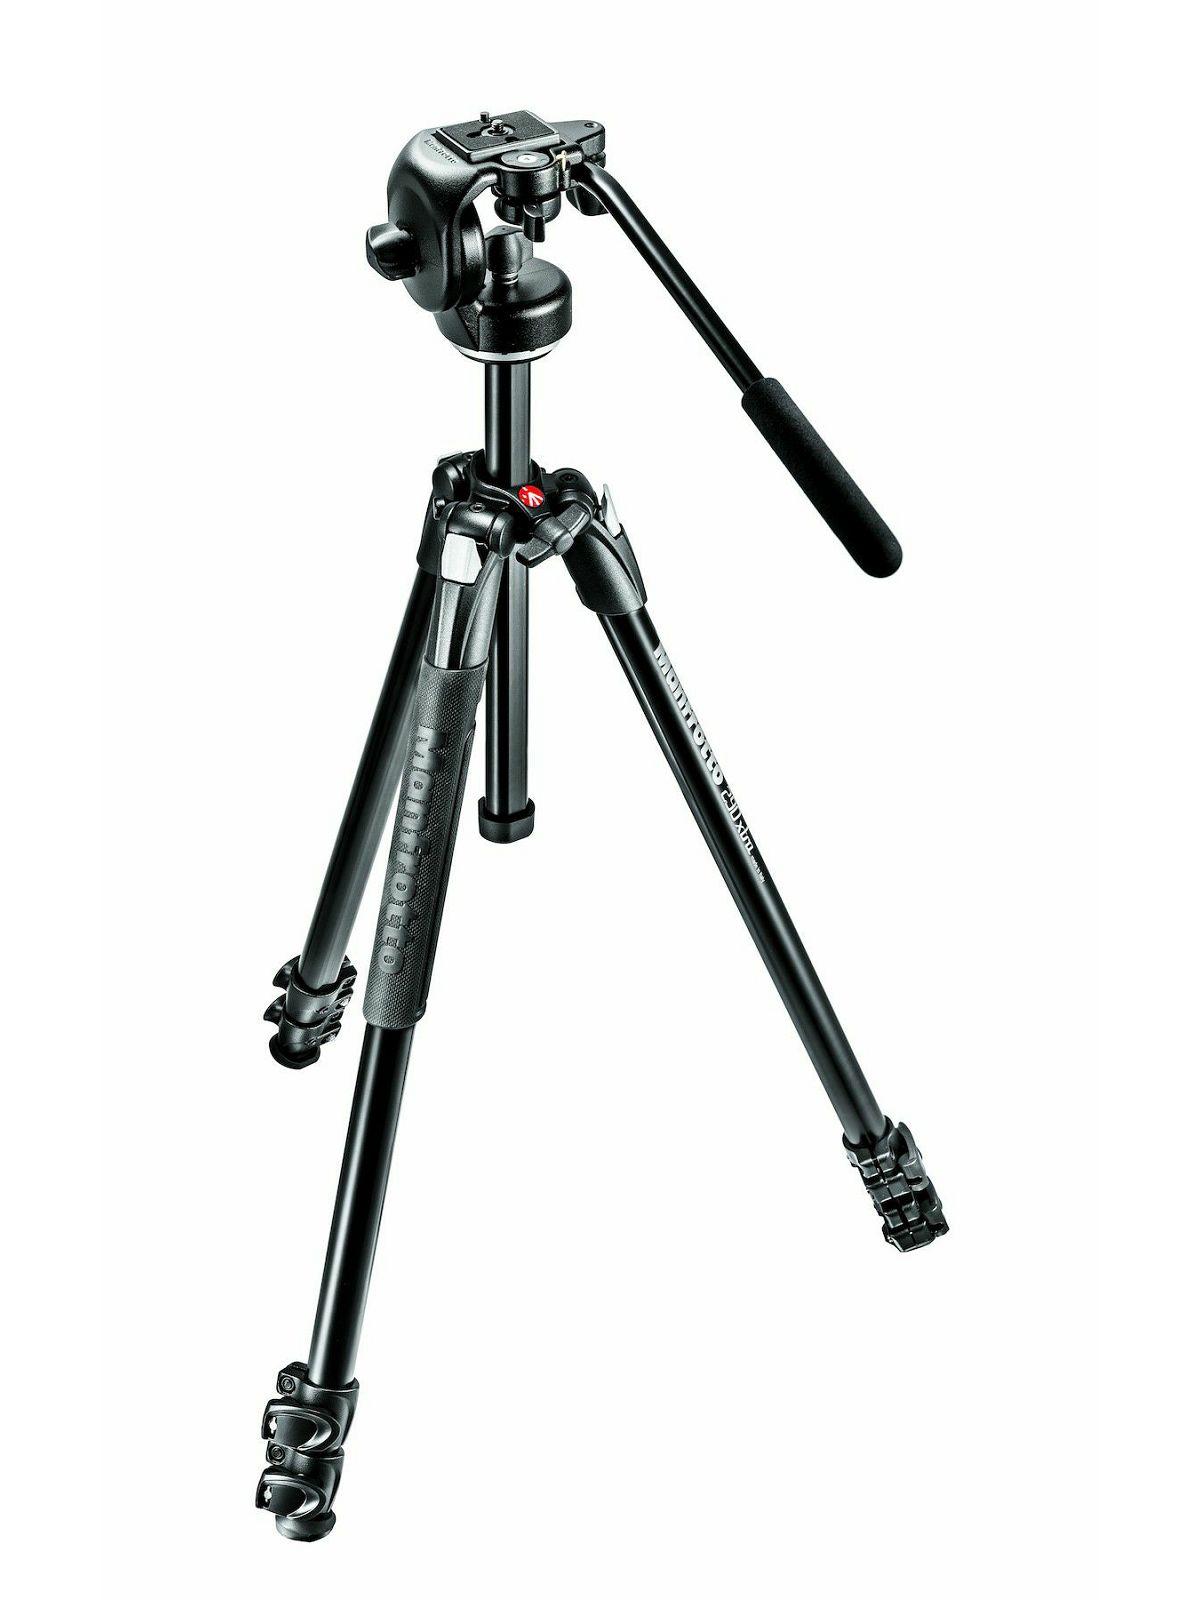 Manftotto MK290 XTRA Tripod Kit stativ s 128RC video glavom MK290XTA3-2W